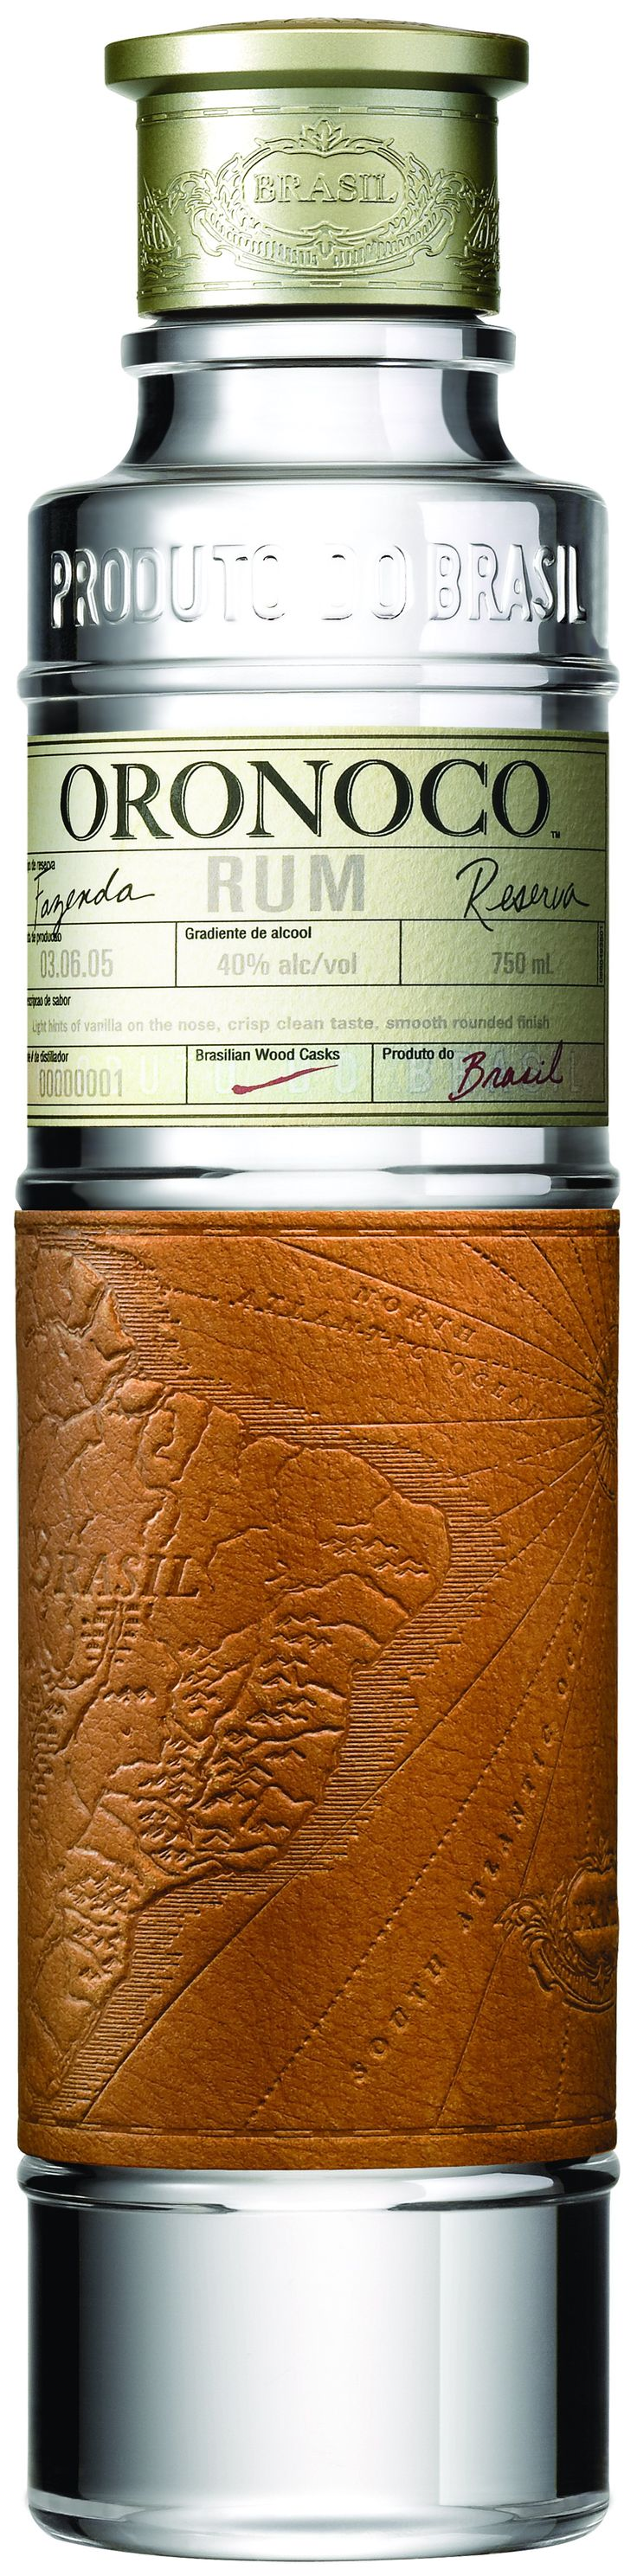 Oronoco Rum PD